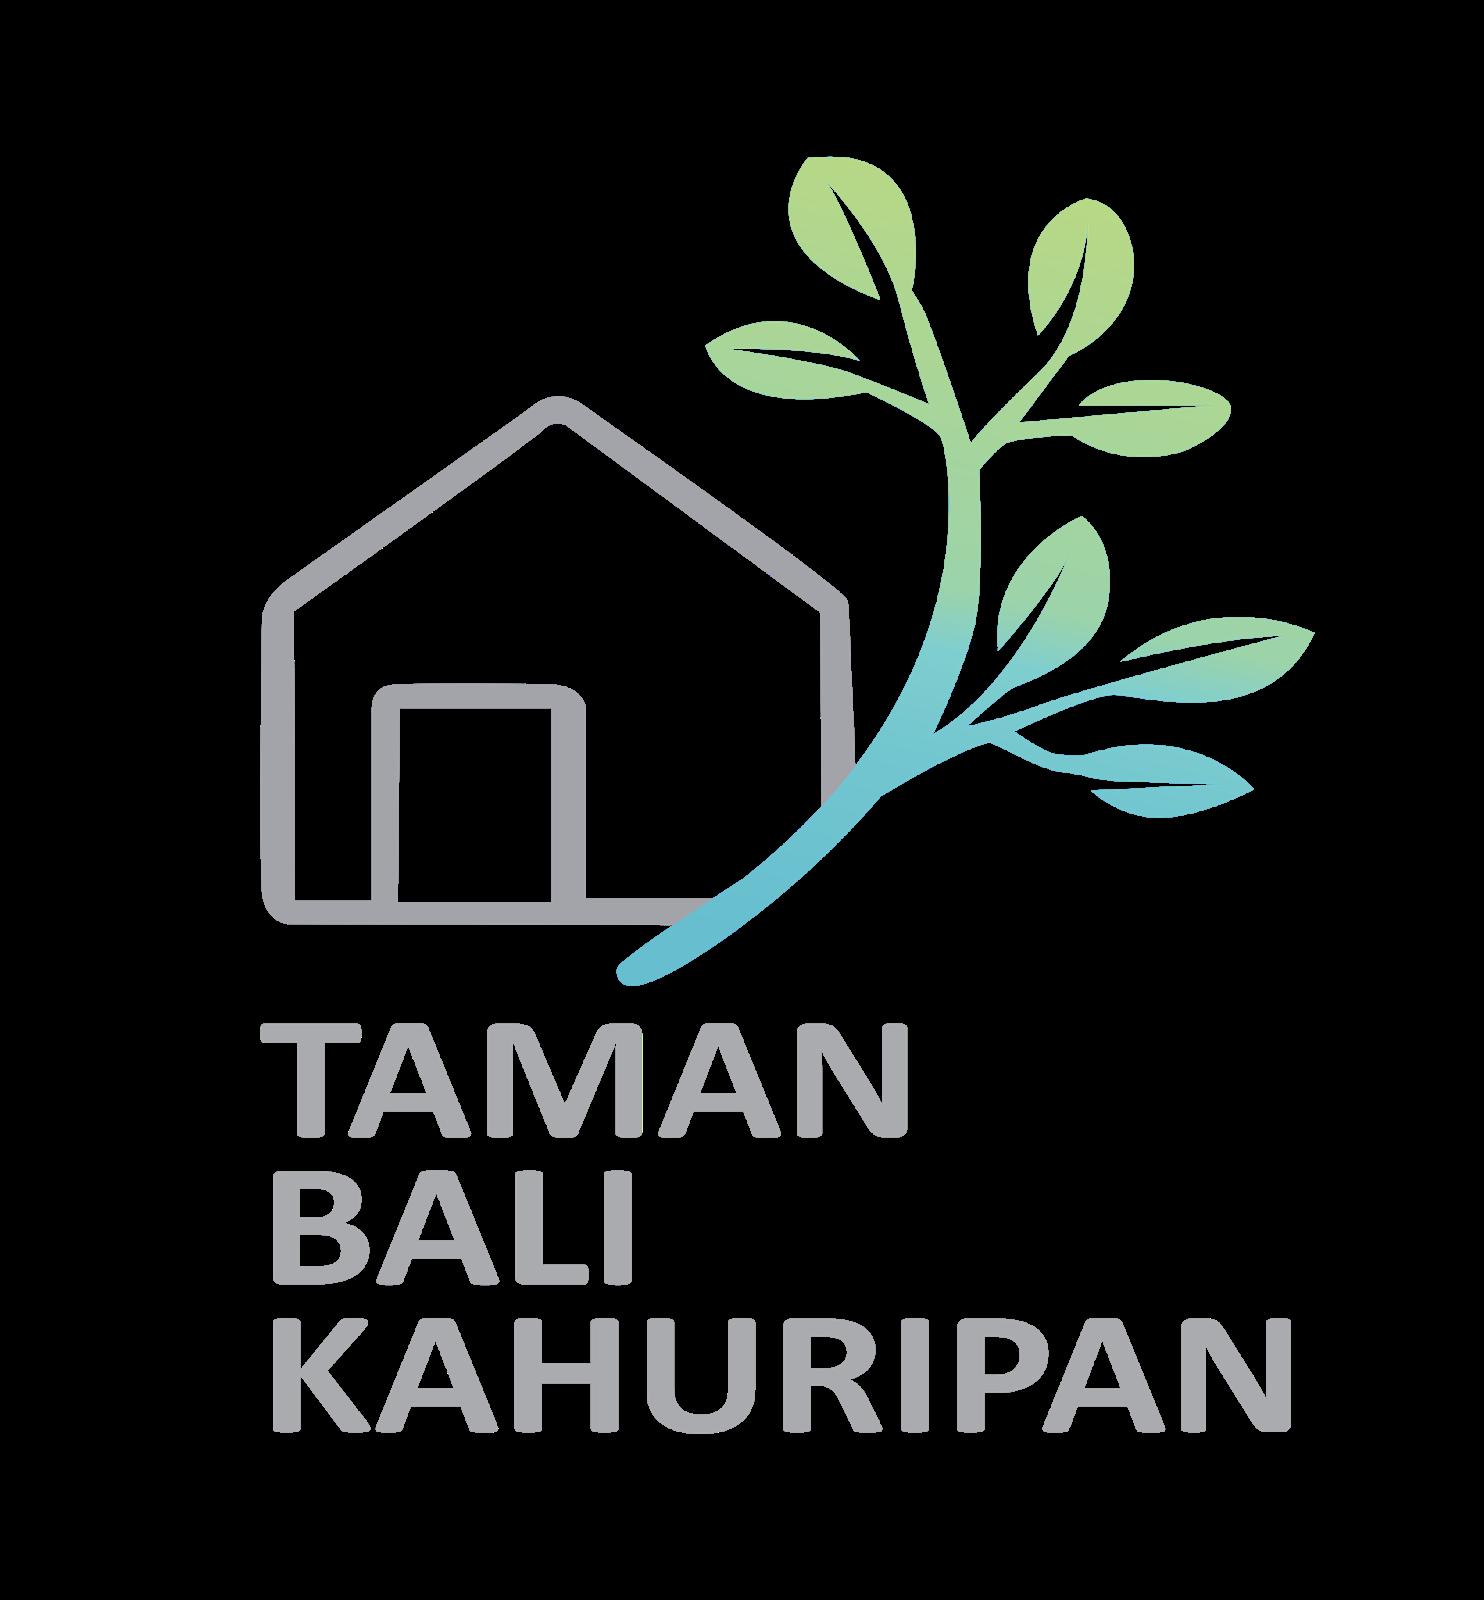 Desain Spanduk: Logo Perumahan Taman Bali Kahuripan